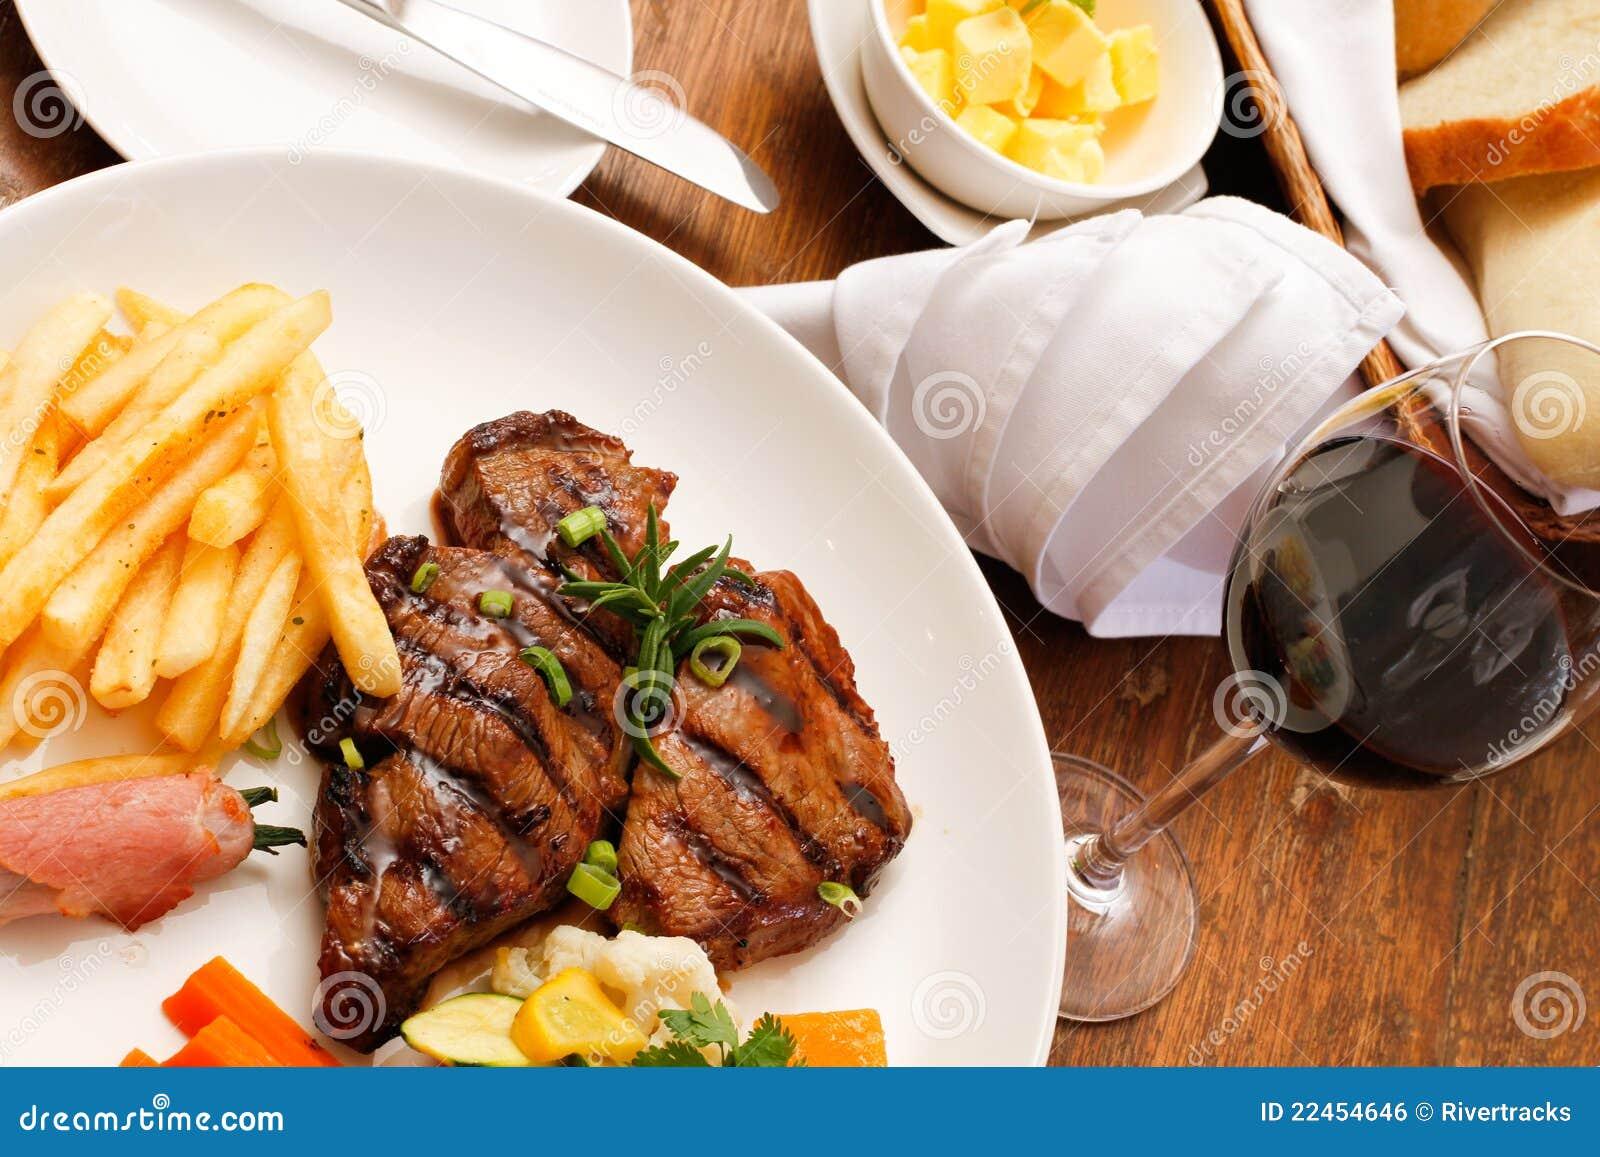 Plaque de nourriture dans un restaurant